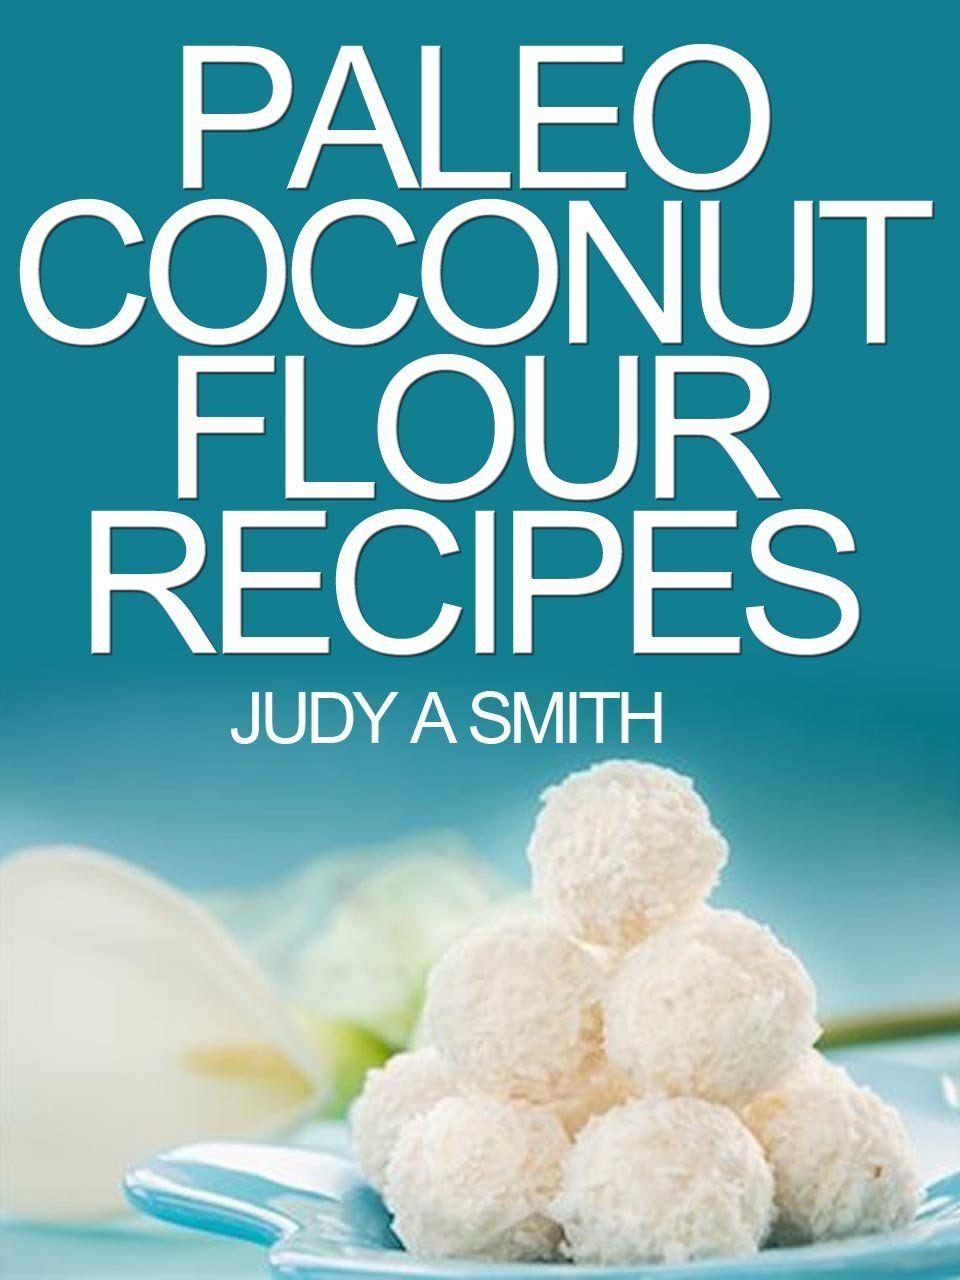 Paleo coconut flour recipe book a health food transformation guide paleo coconut flour recipe book a health food transformation guide 499 forumfinder Choice Image